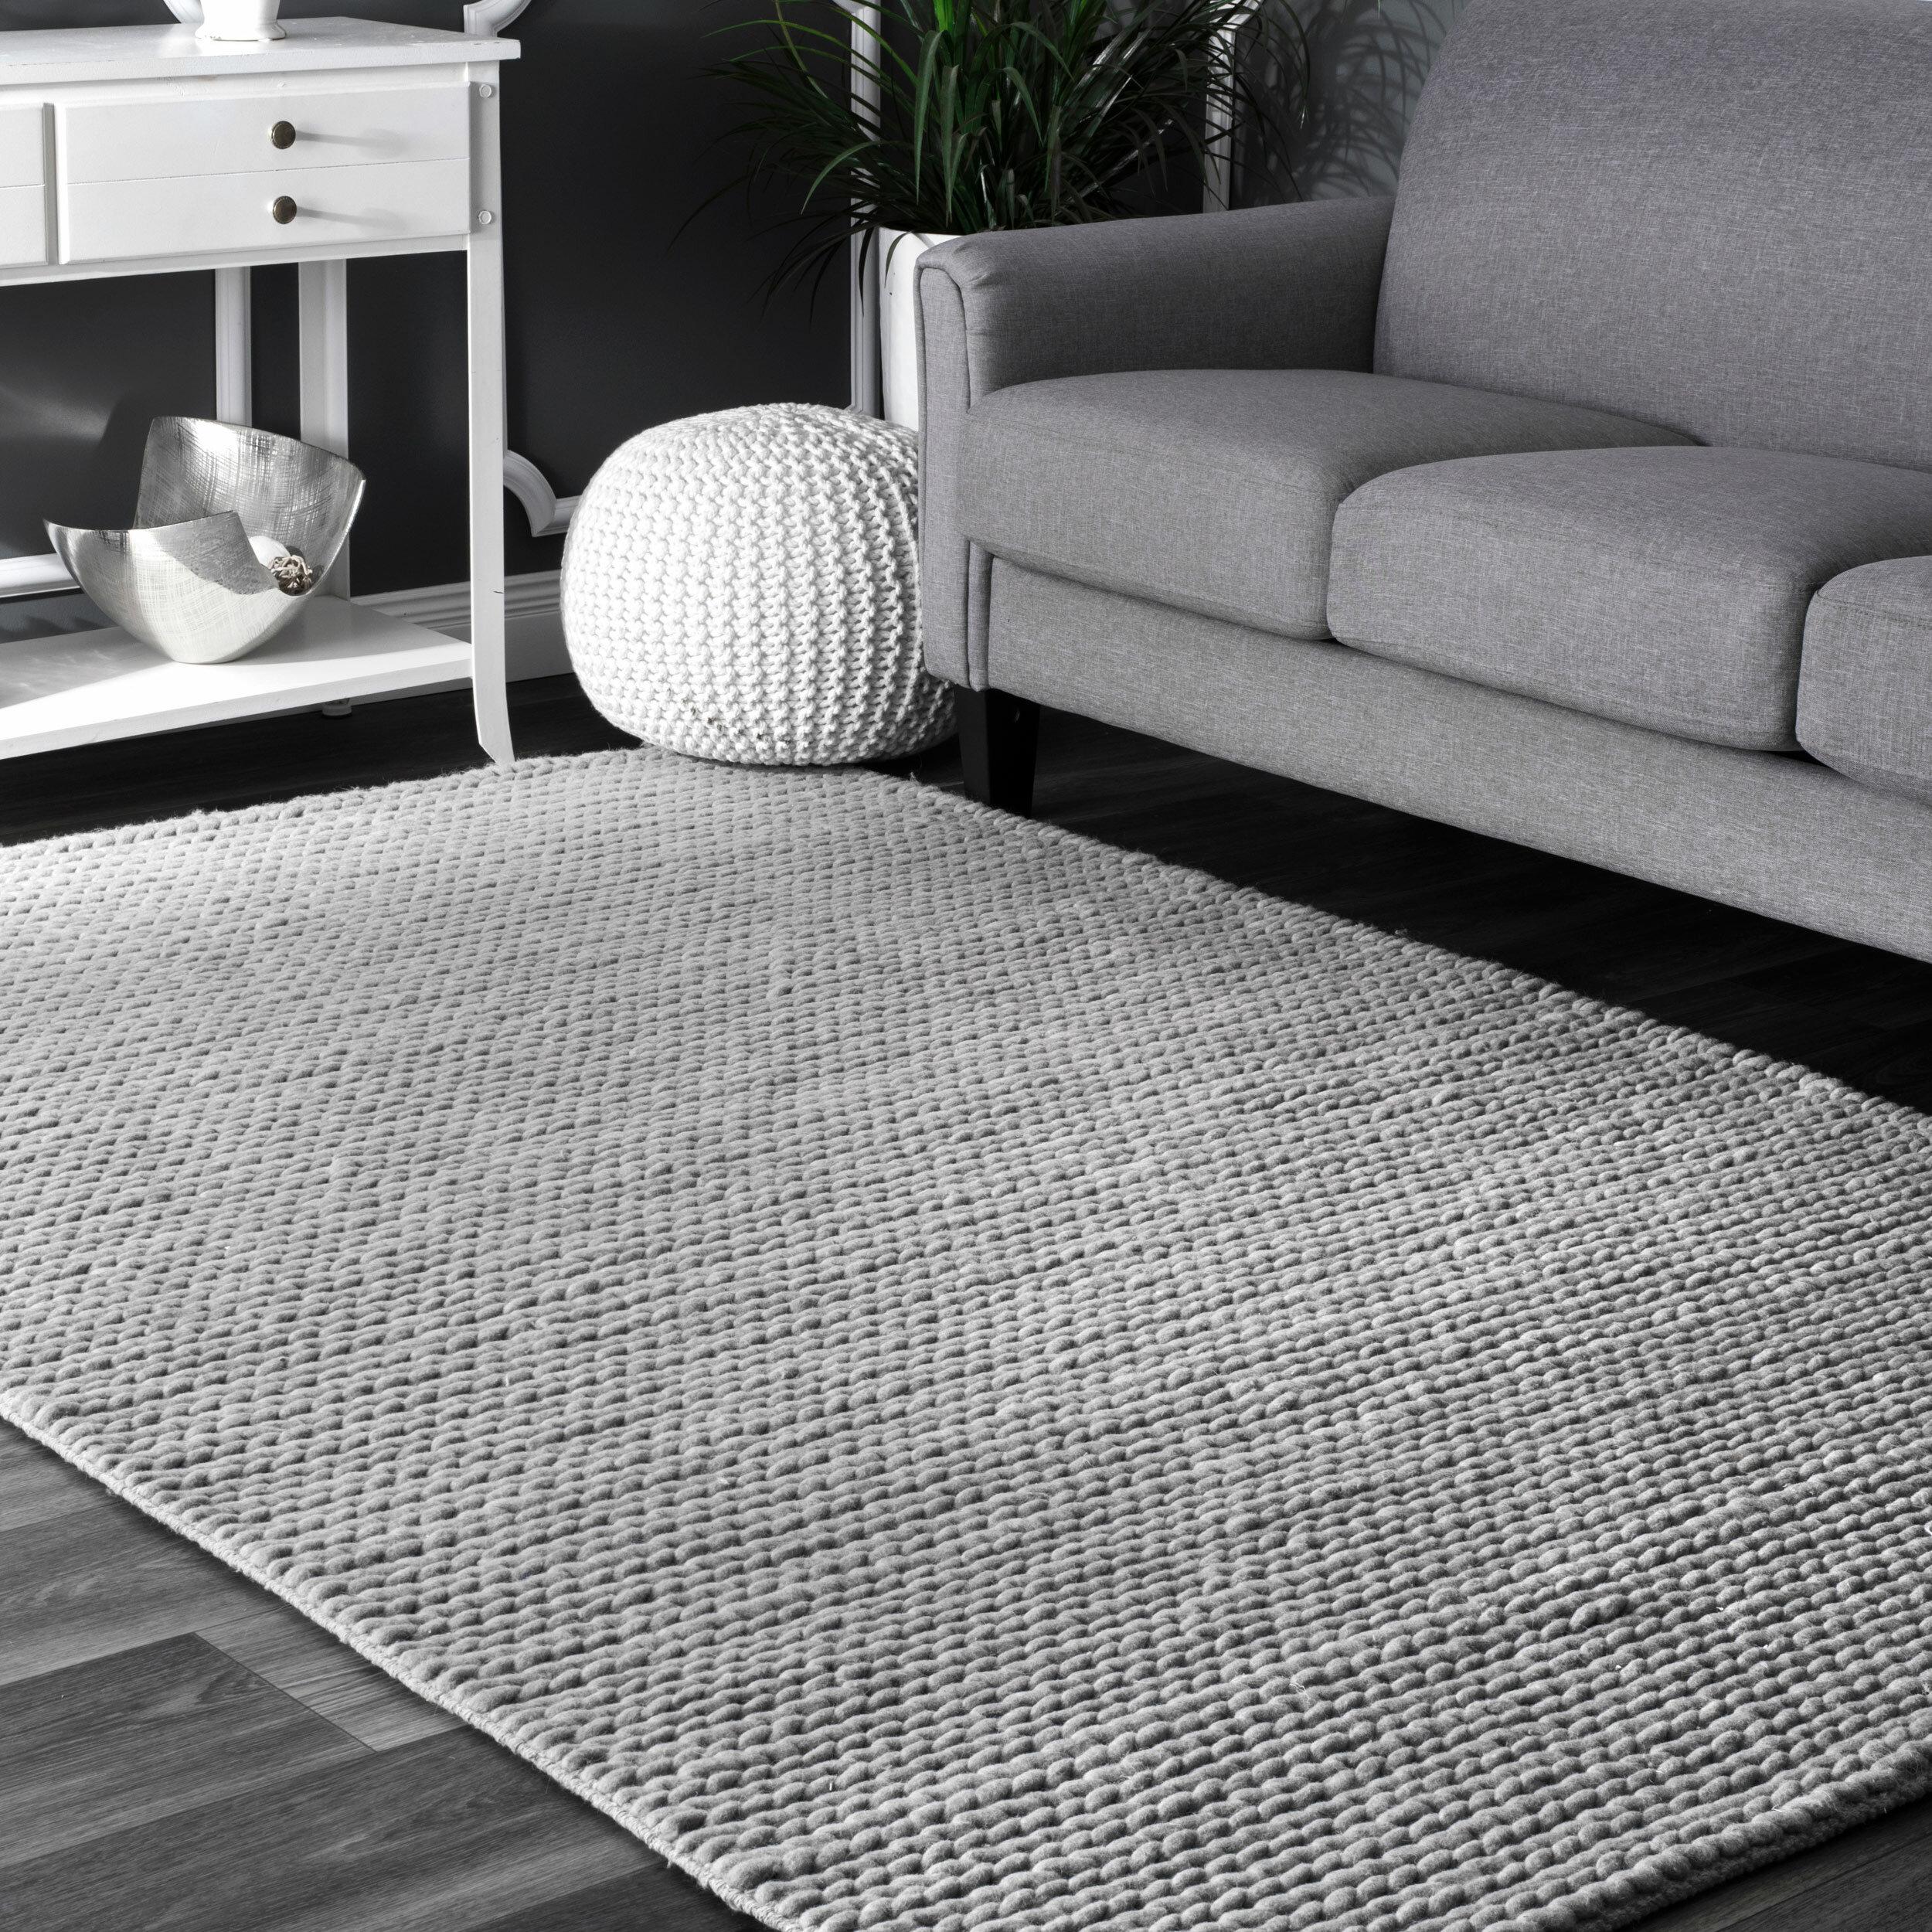 Langley street makenzie woolen cable hand woven light grey area rug reviews wayfair ca